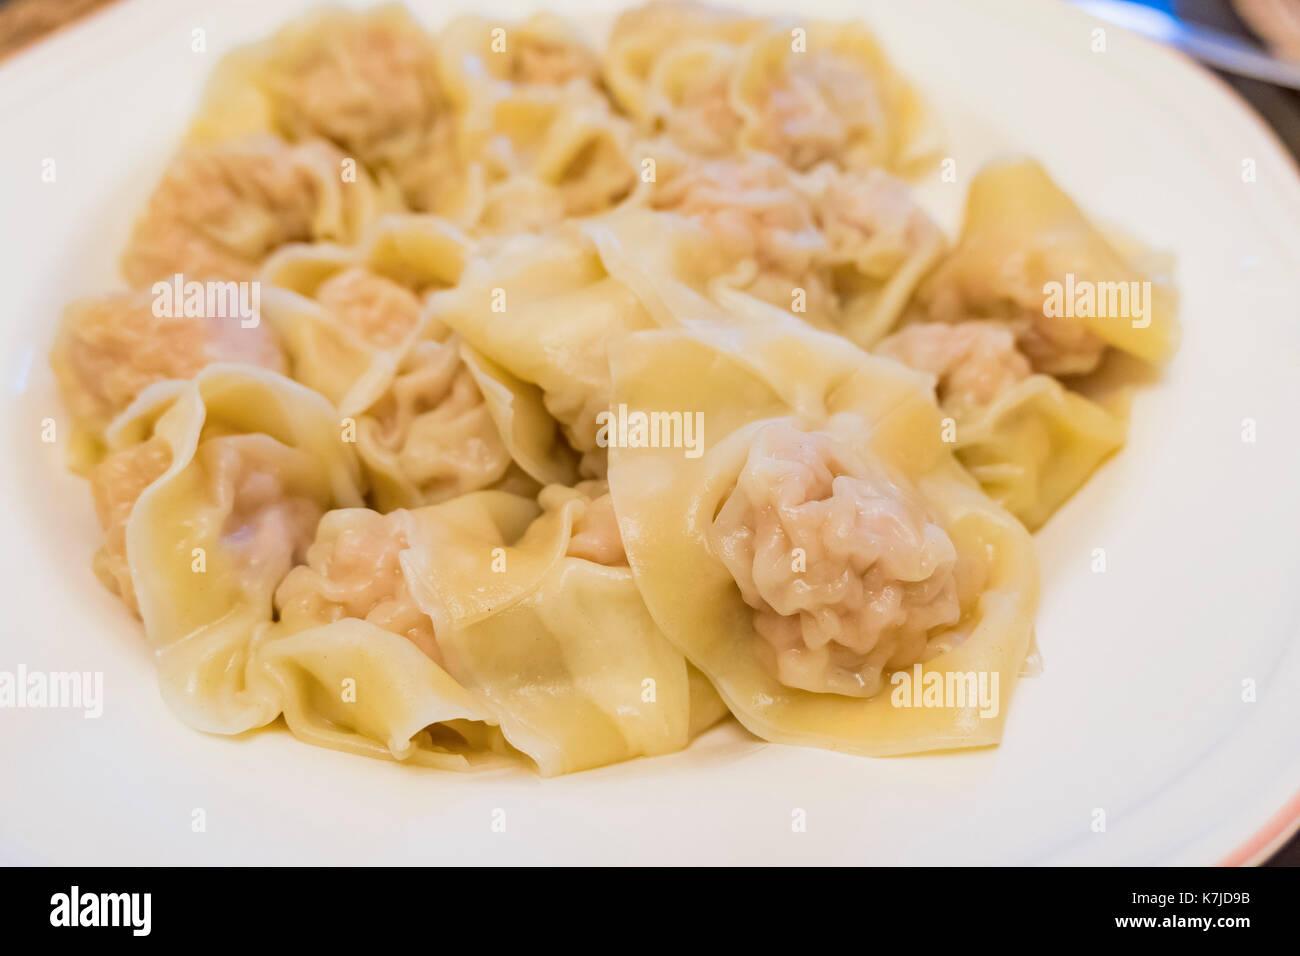 Making the cantonese style handmade wonton (Dumpling) at home - Stock Image